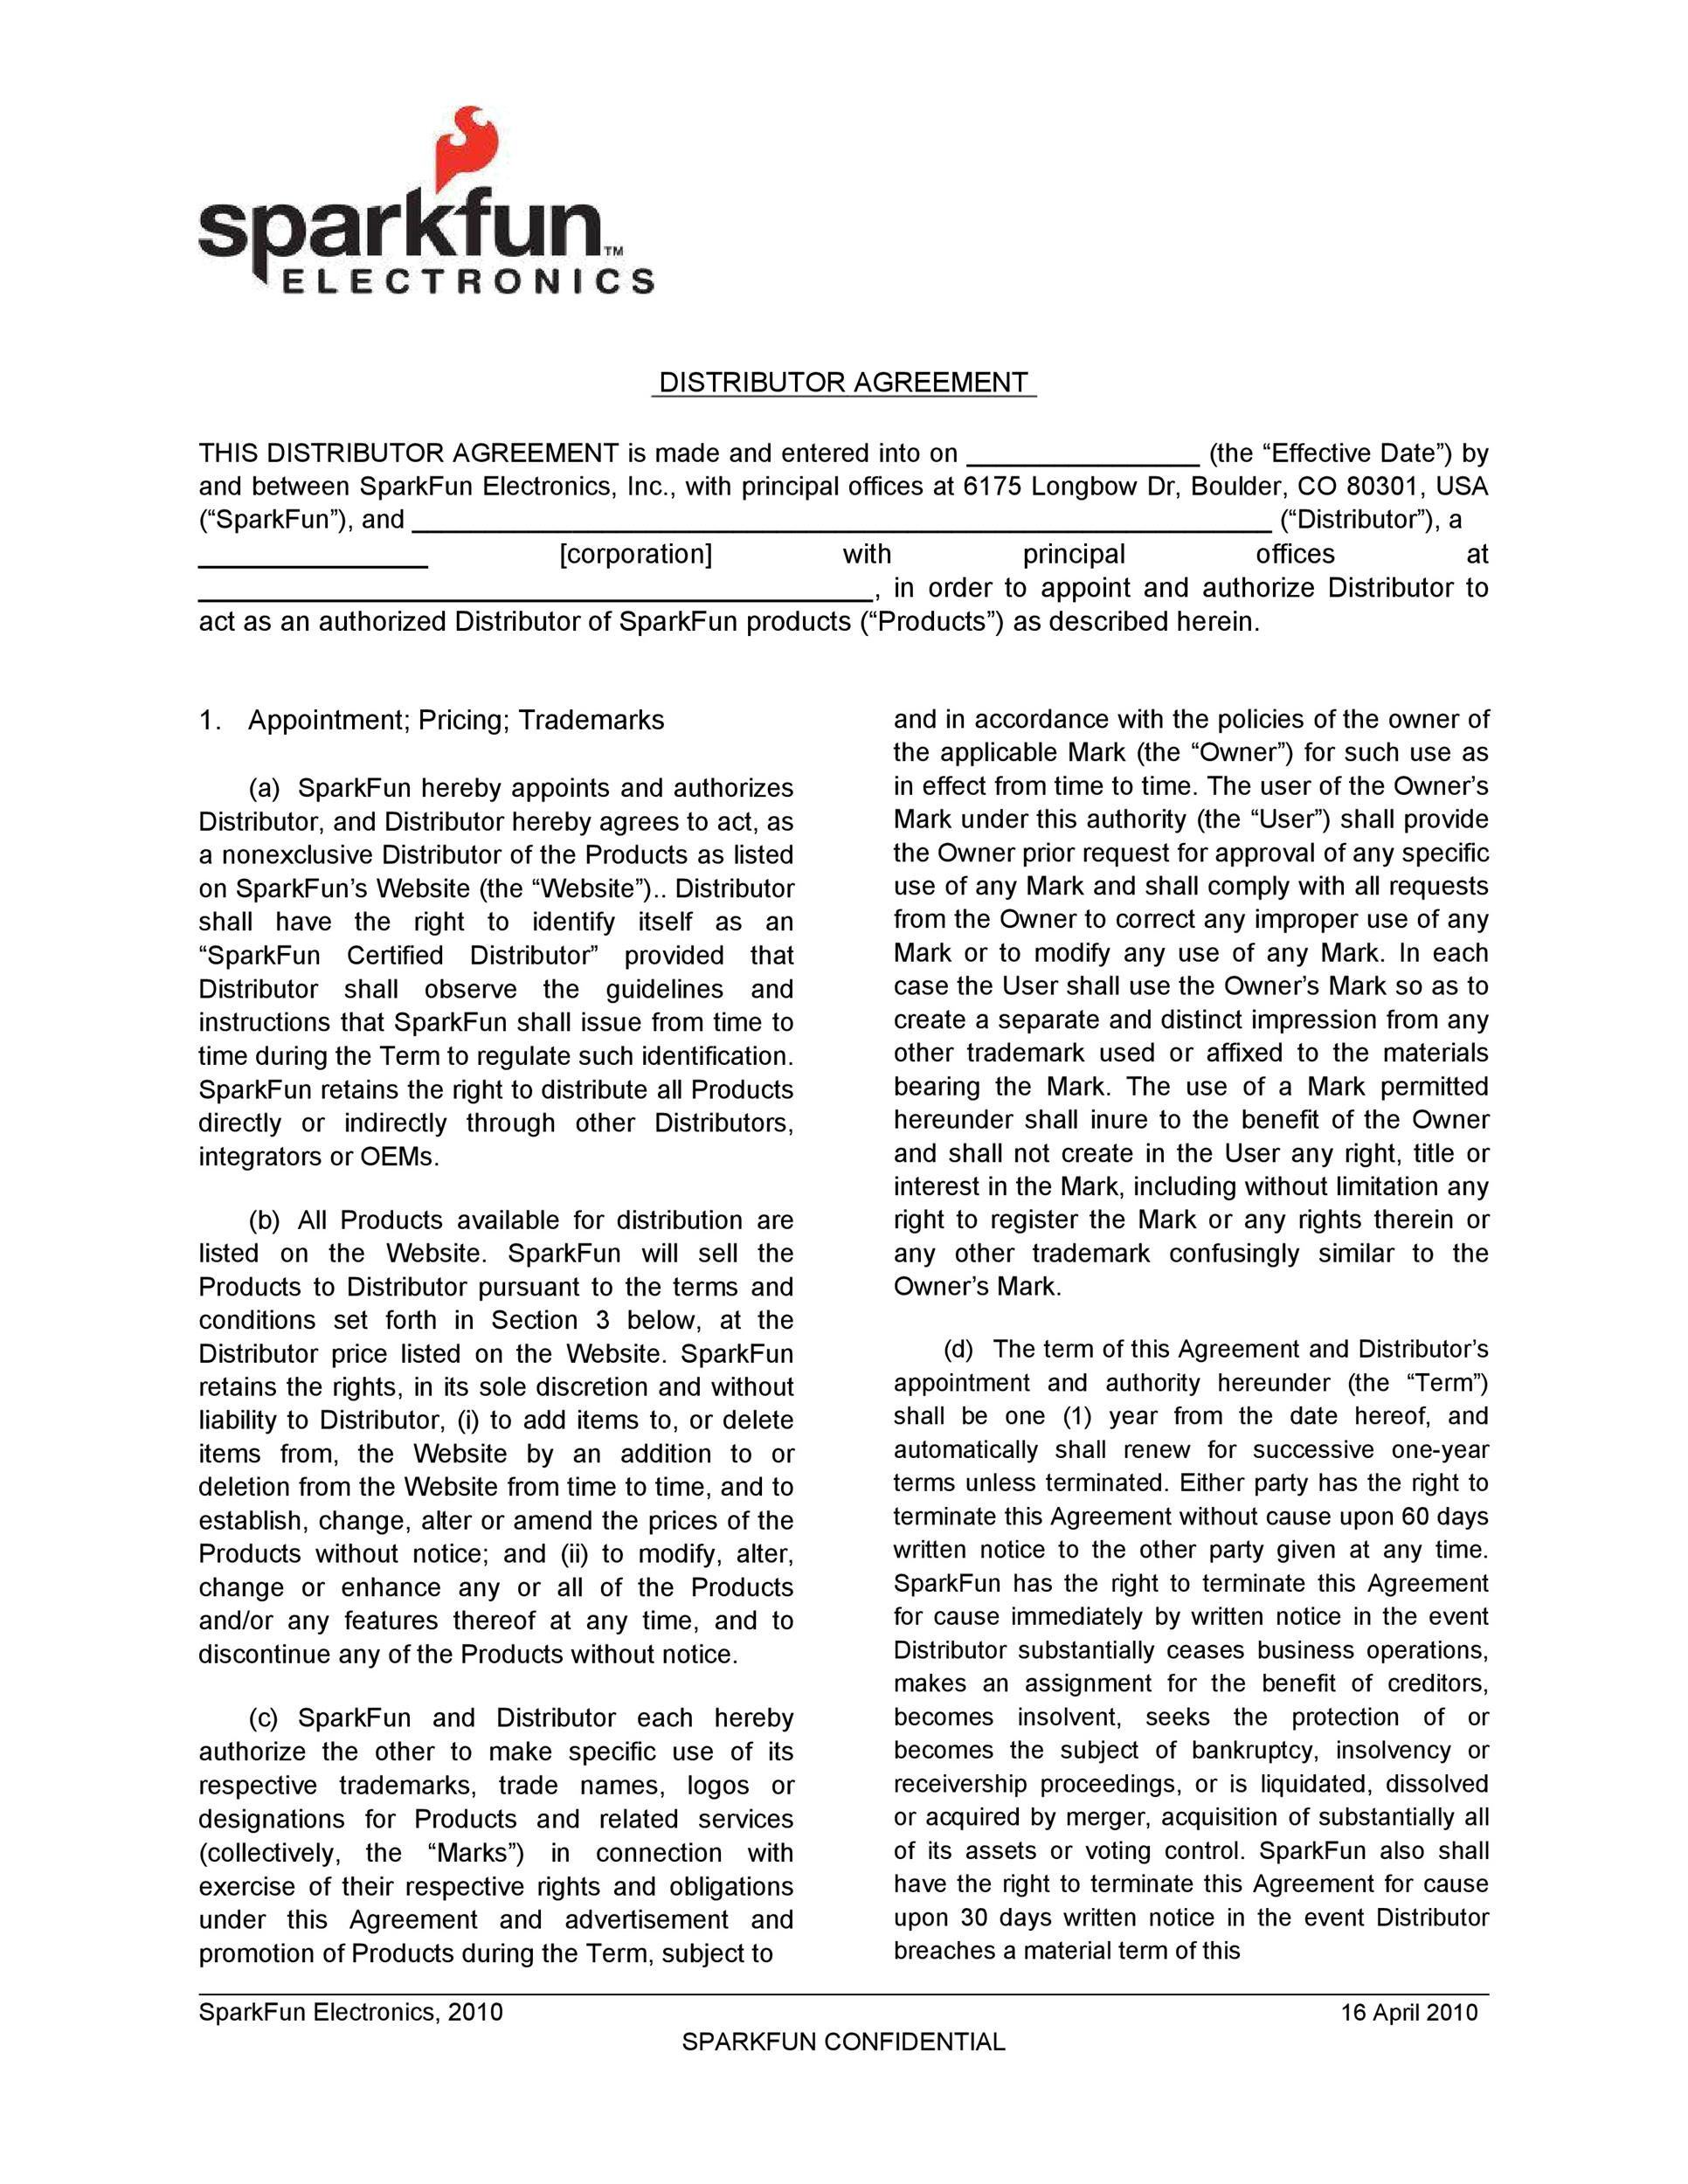 Free distribution agreement 05